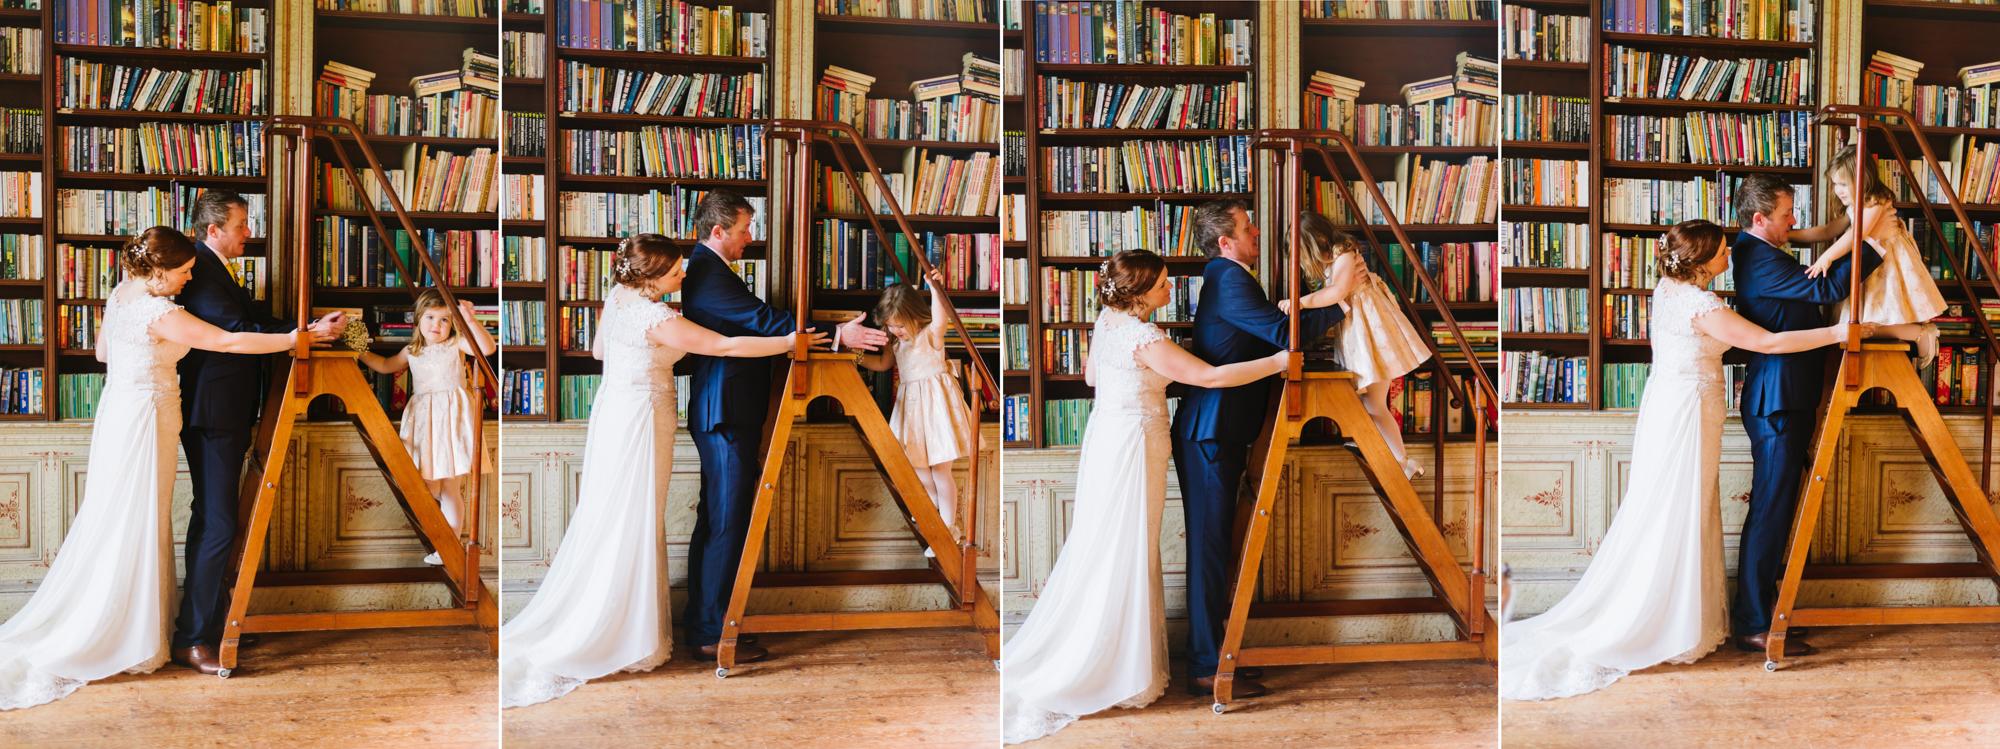 Stacey_Mark_Wedding-180